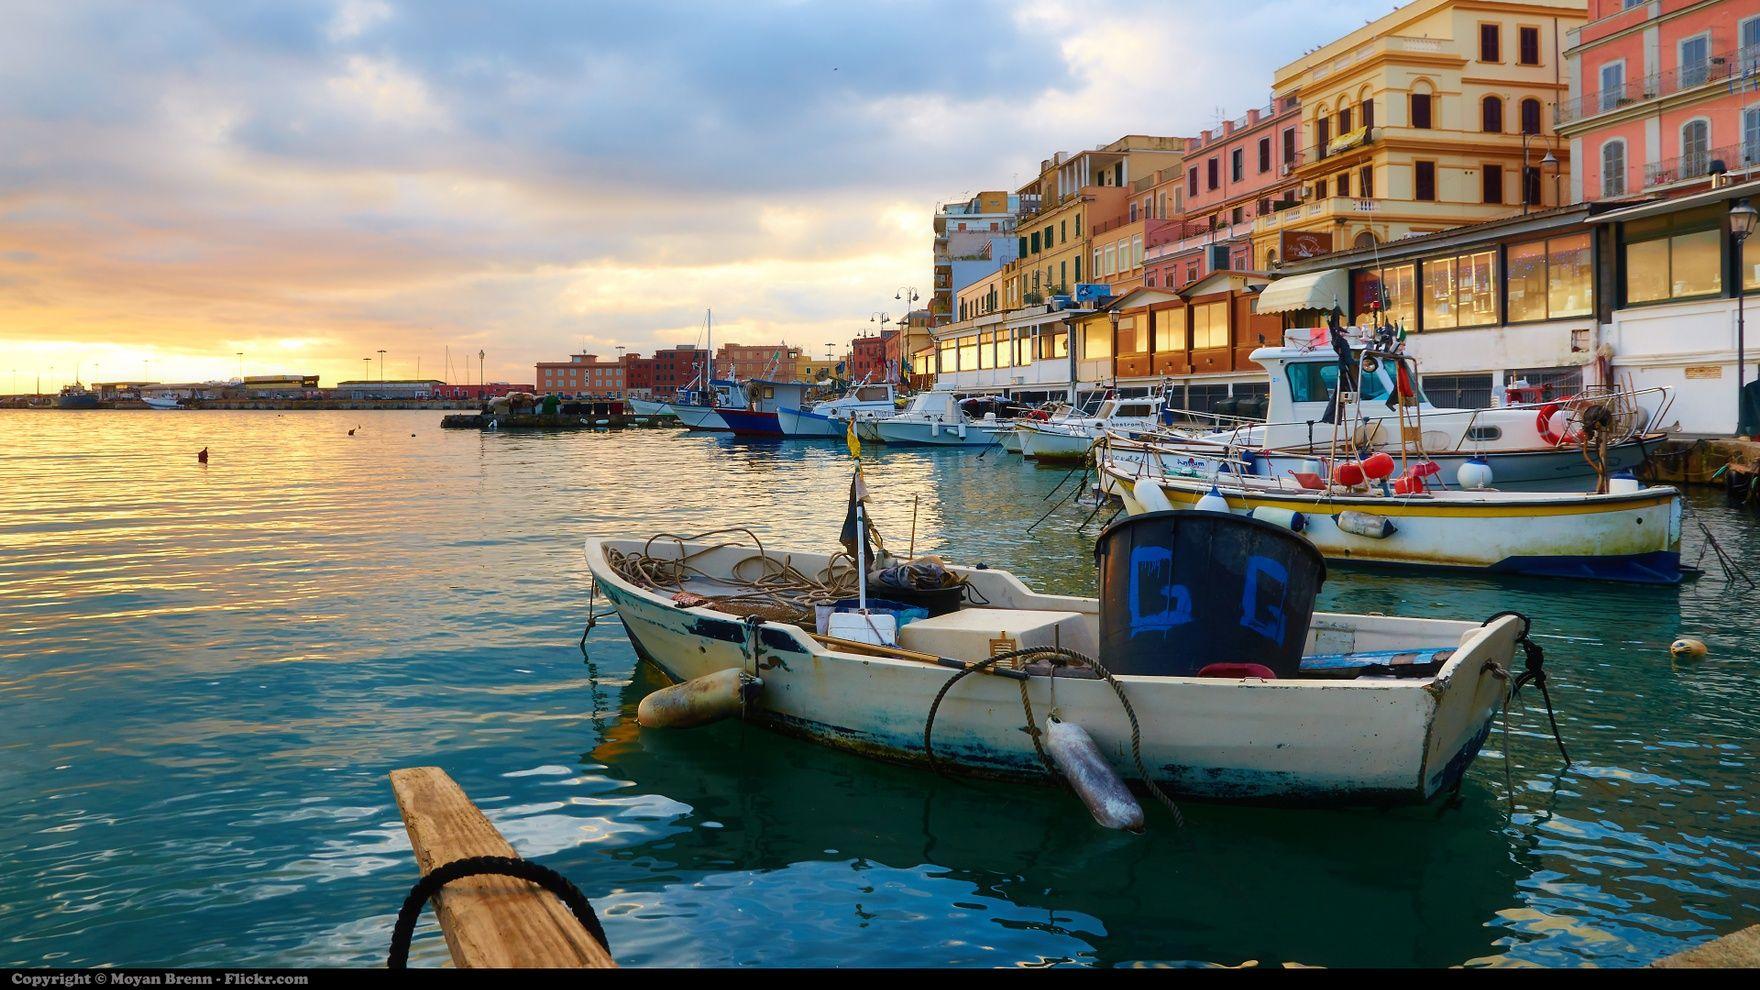 Italian Vacation: from Rome to Naples